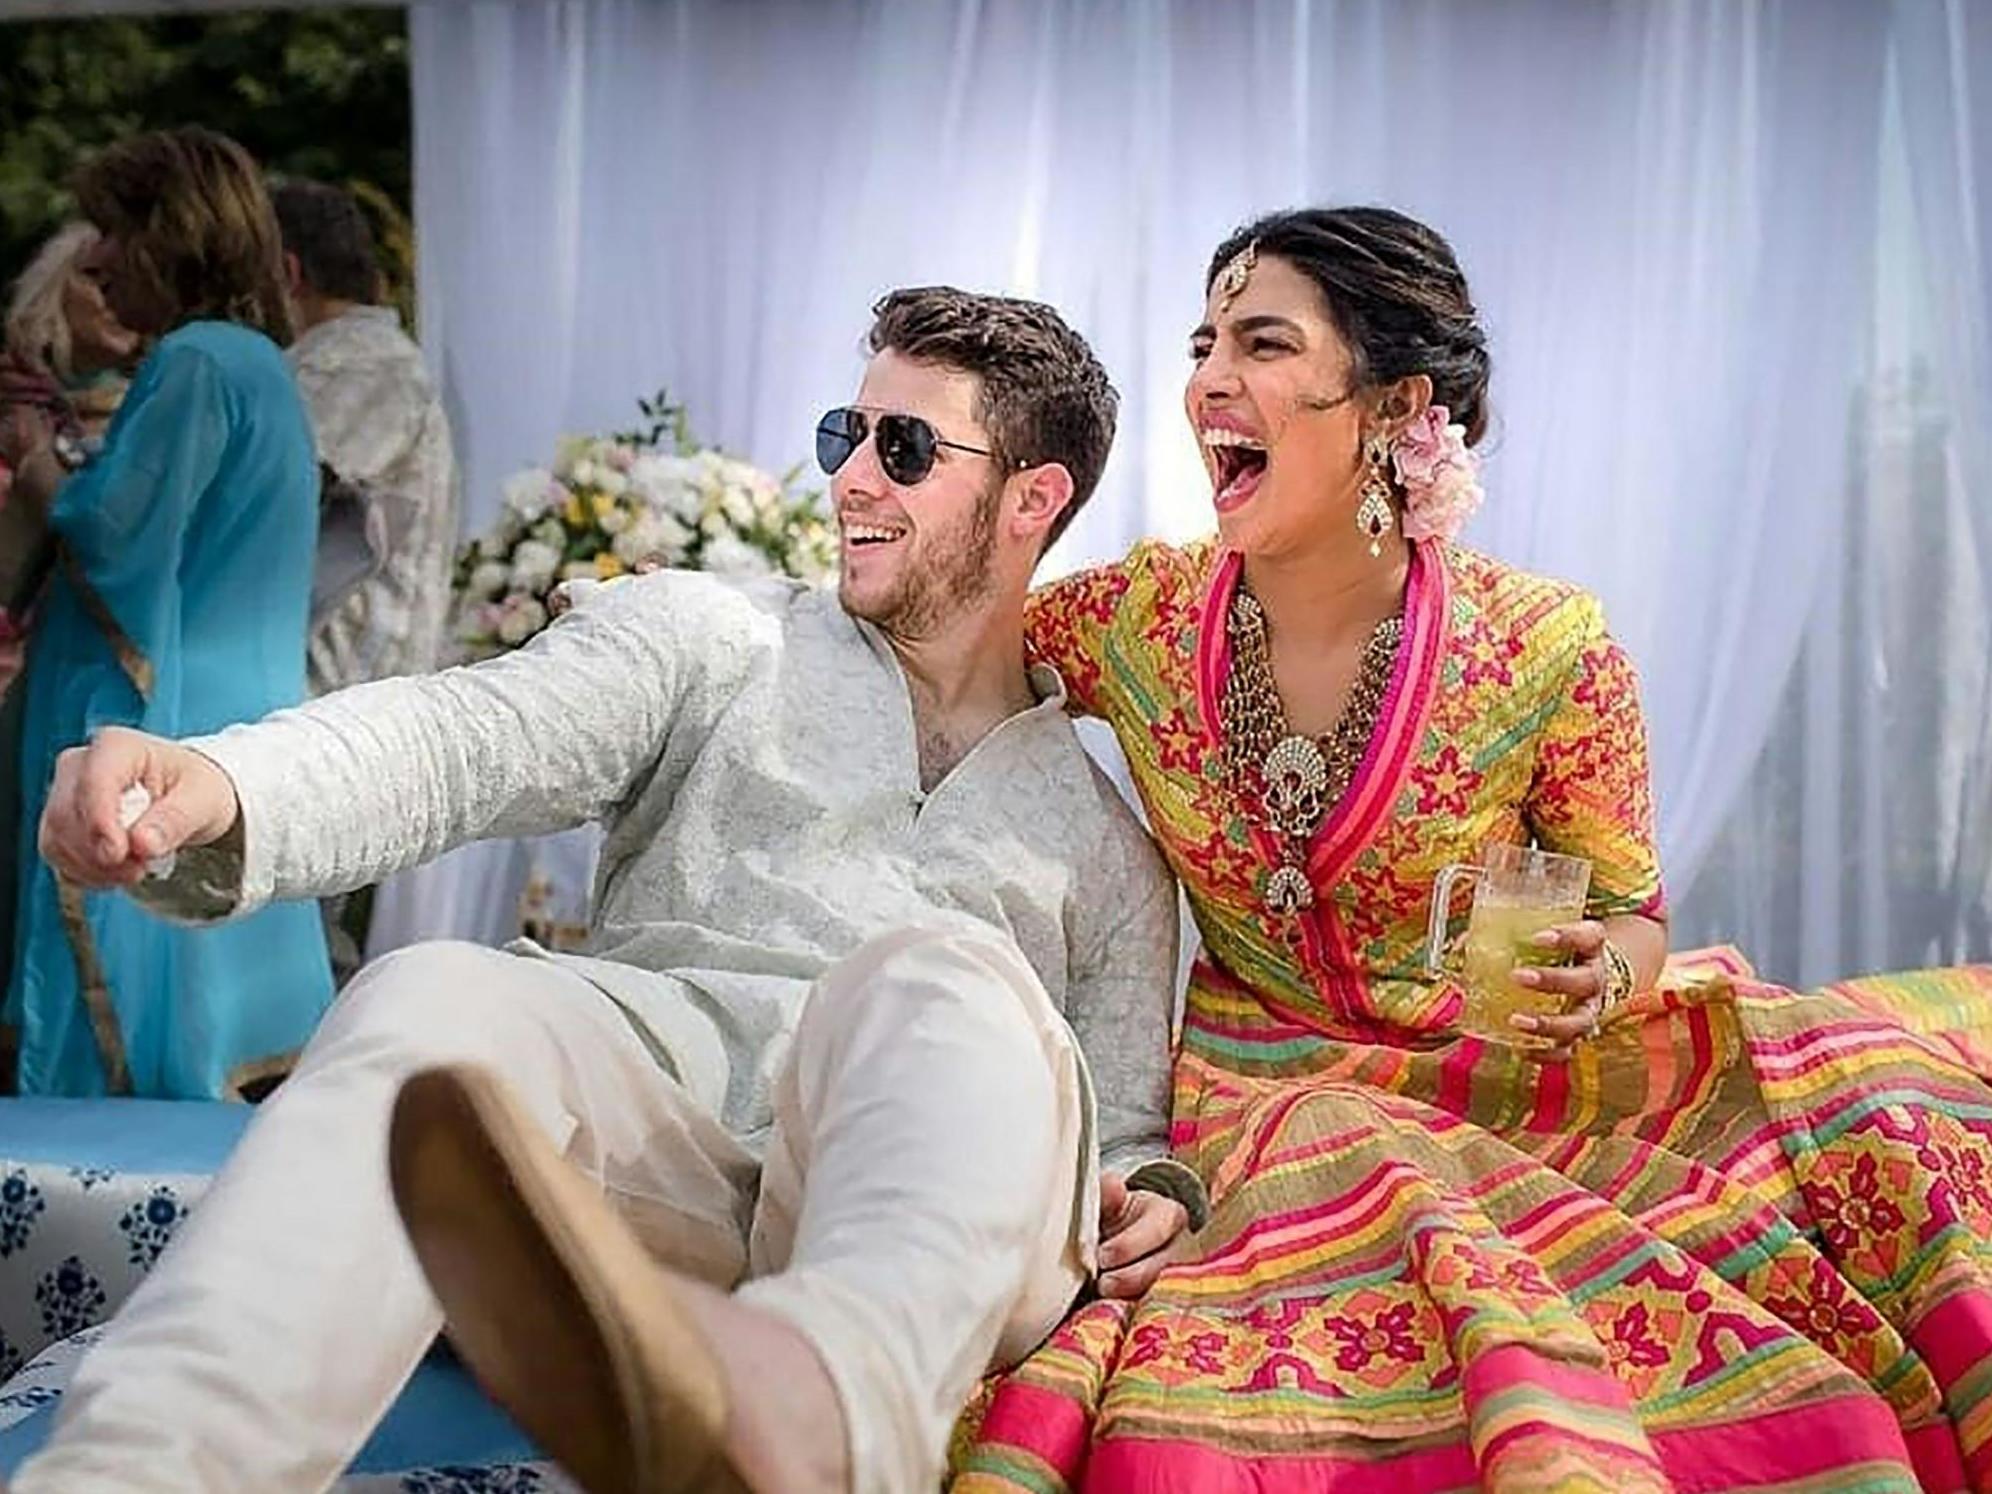 Priyanka Chopra Wore Two Wedding Gowns To Marry Nick Jonas And